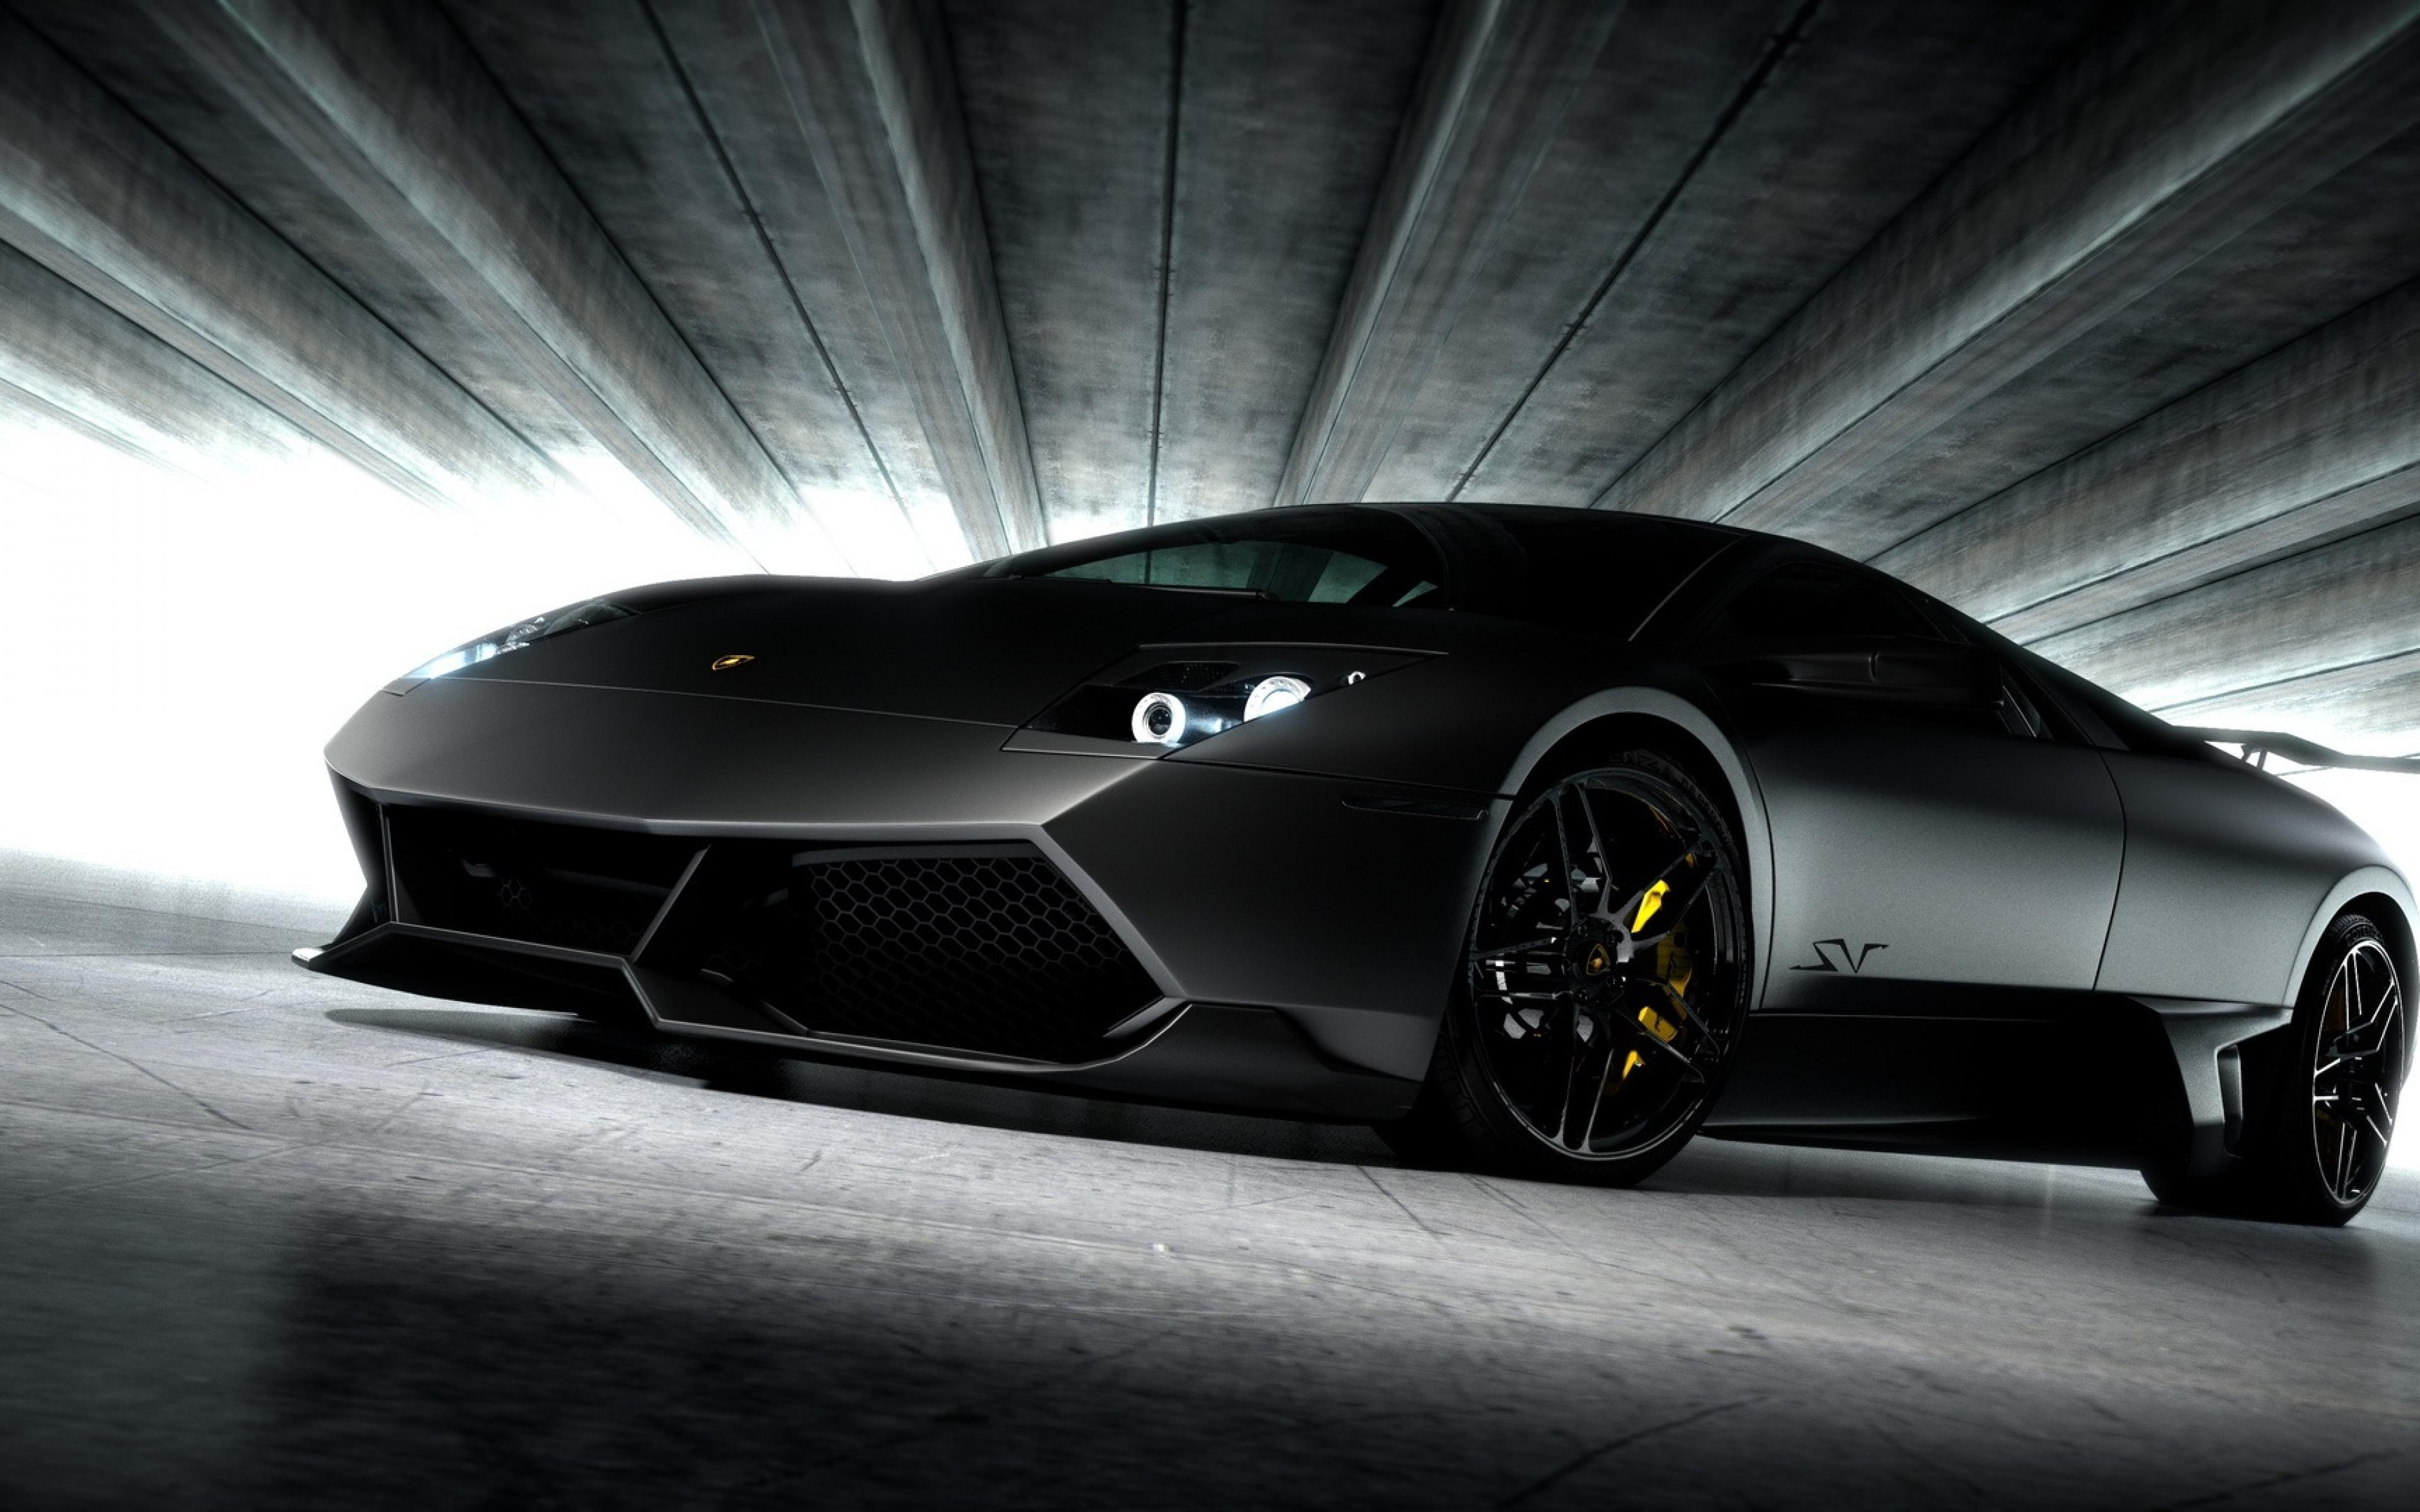 Lamborghini Murcielago Desktop